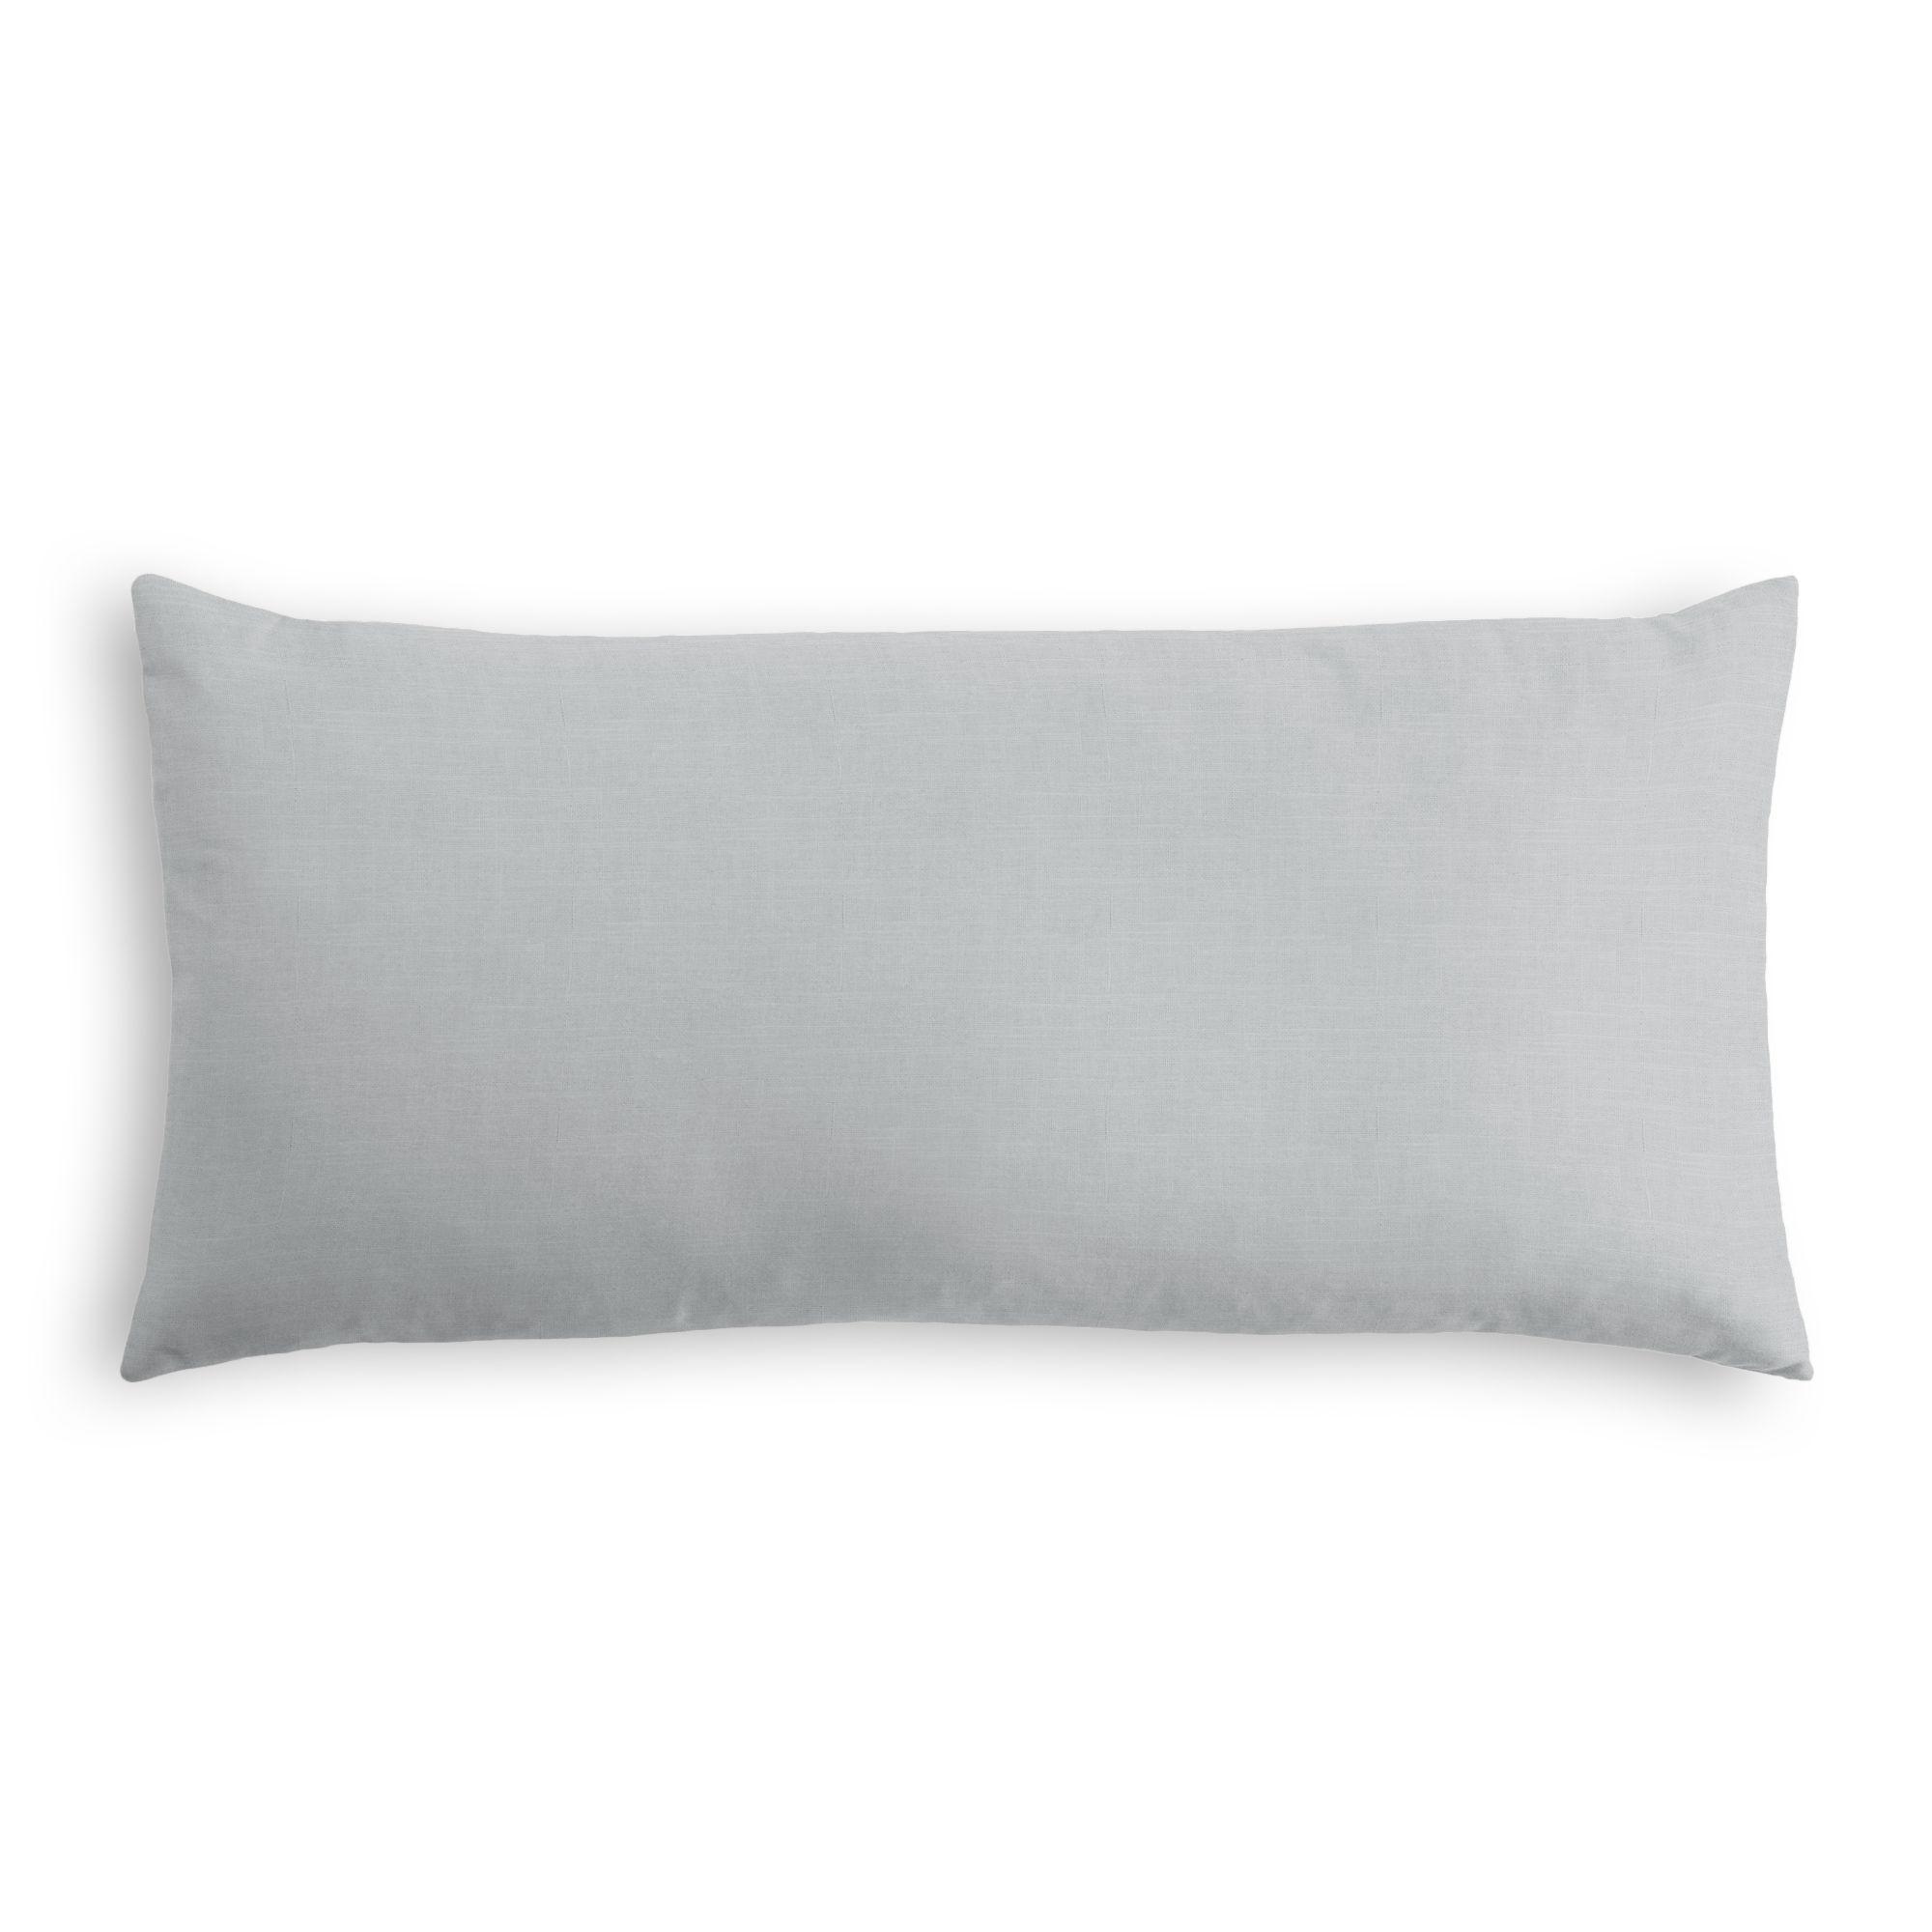 "Classic Linen Pillow, Classic Gray, 12"" x 18"" Lumbar"